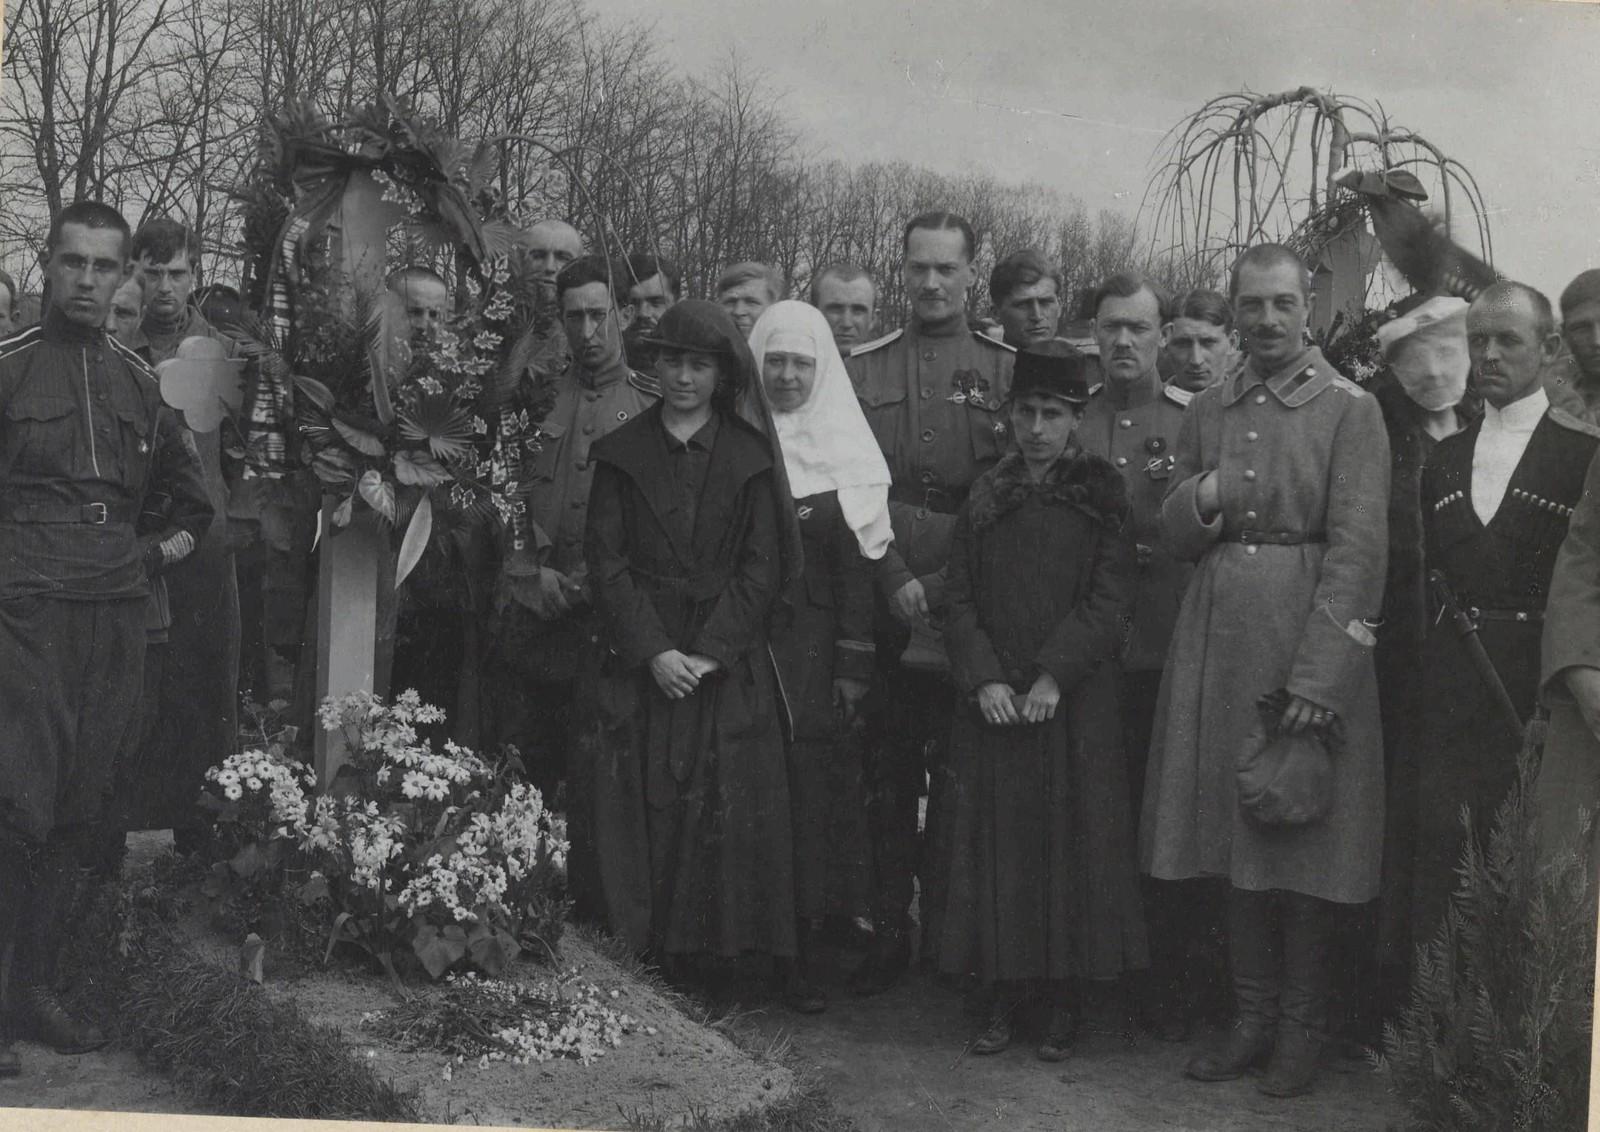 1918. Екатеринодар. Похороны генерала Корнилова